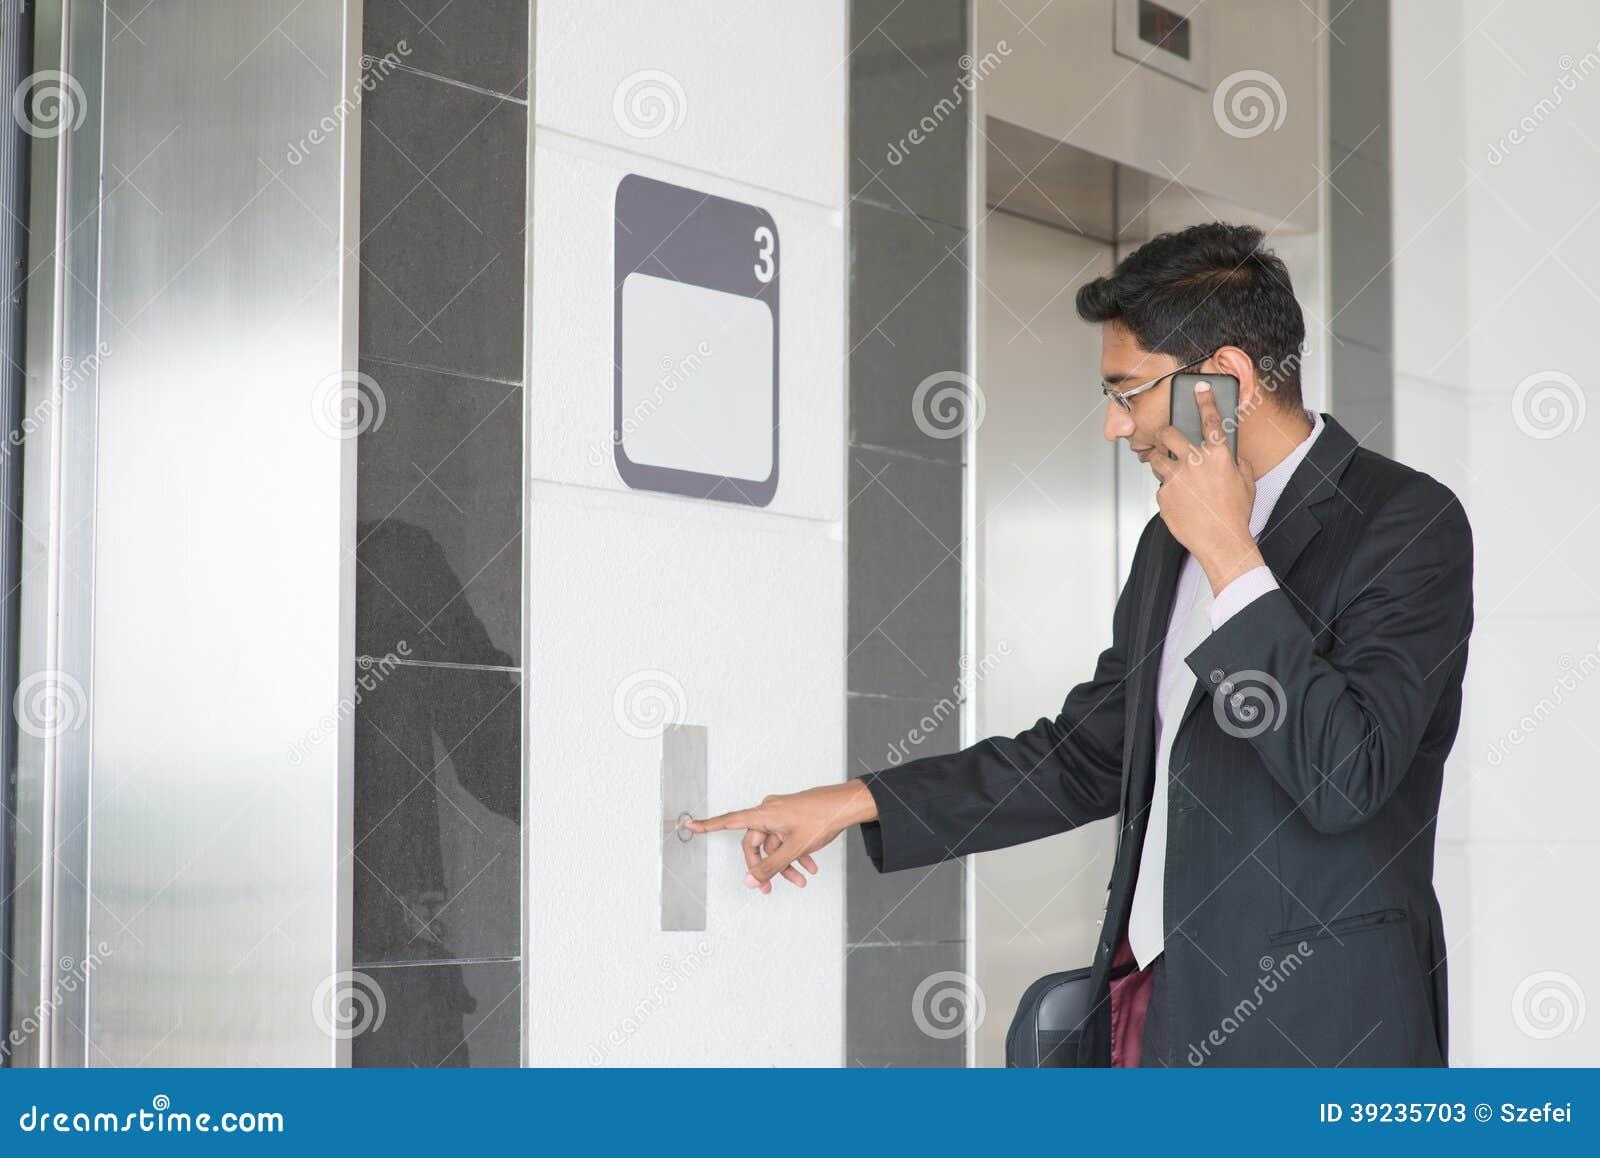 Indian Businessman Entering Elevator Stock Photo Image